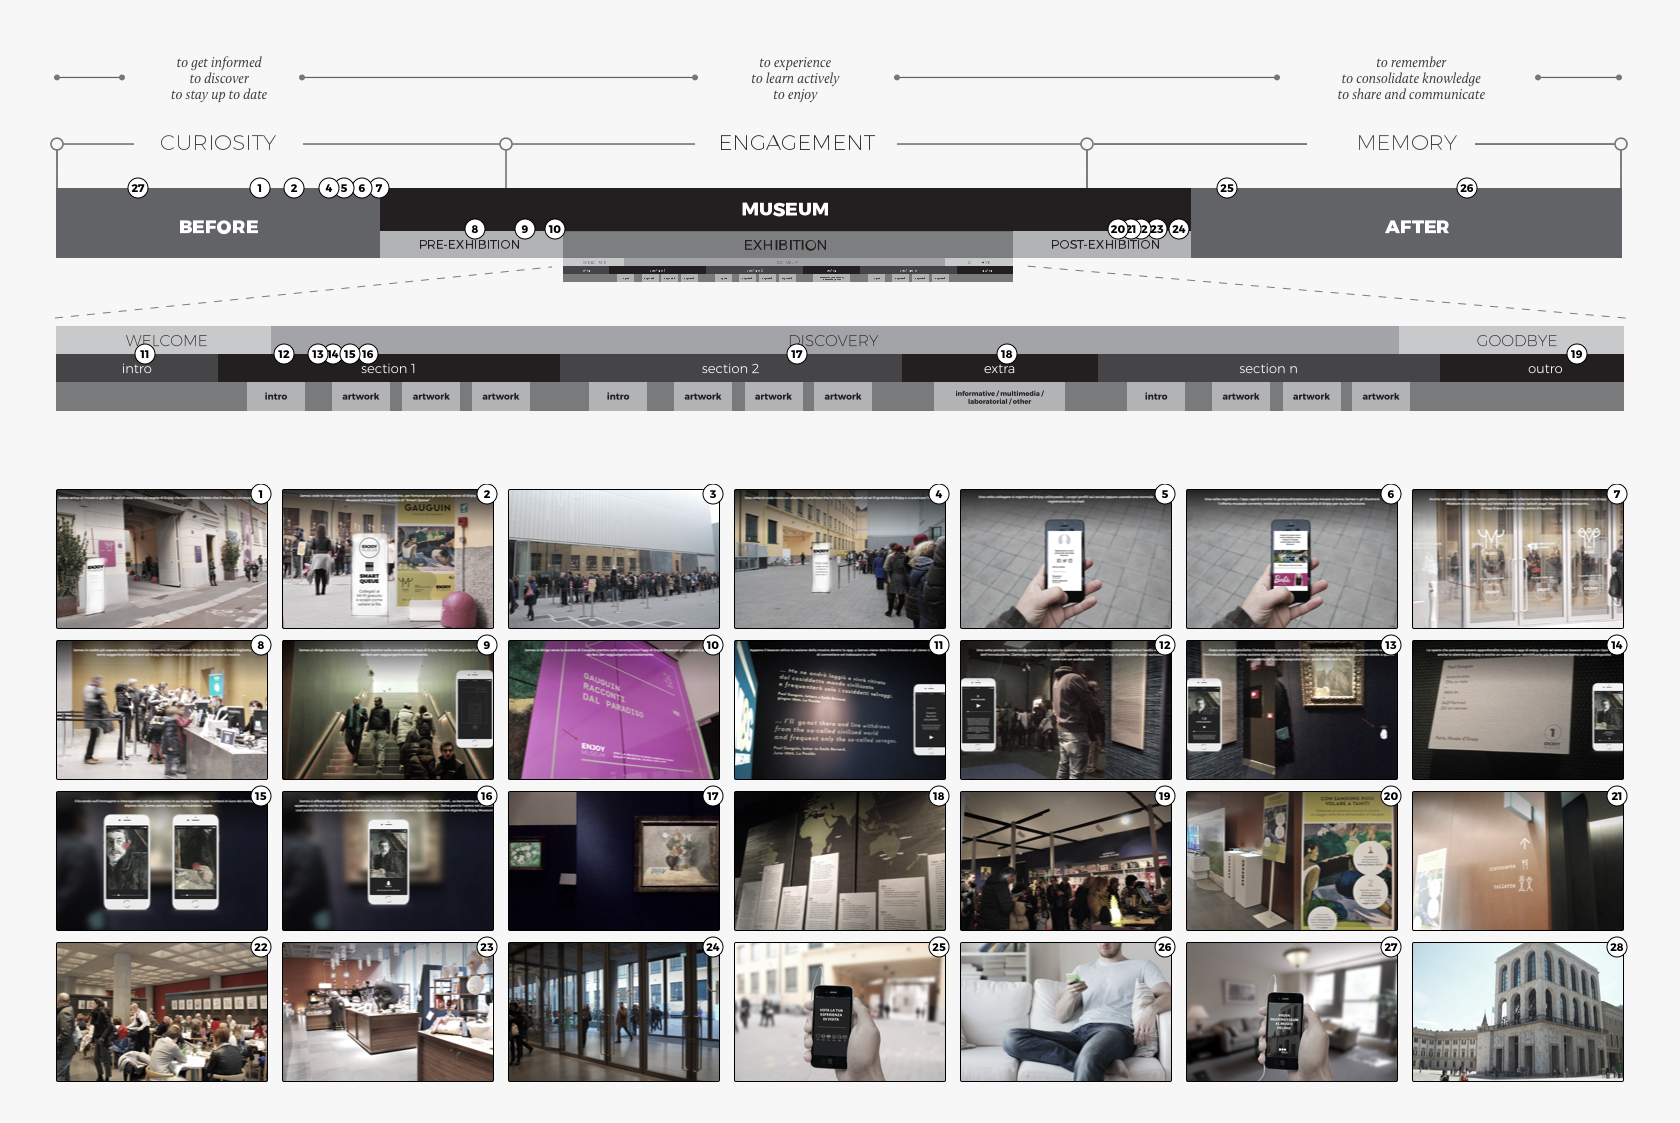 Enjoymuseum. Museum experience design - Fabio Besti - Mudec